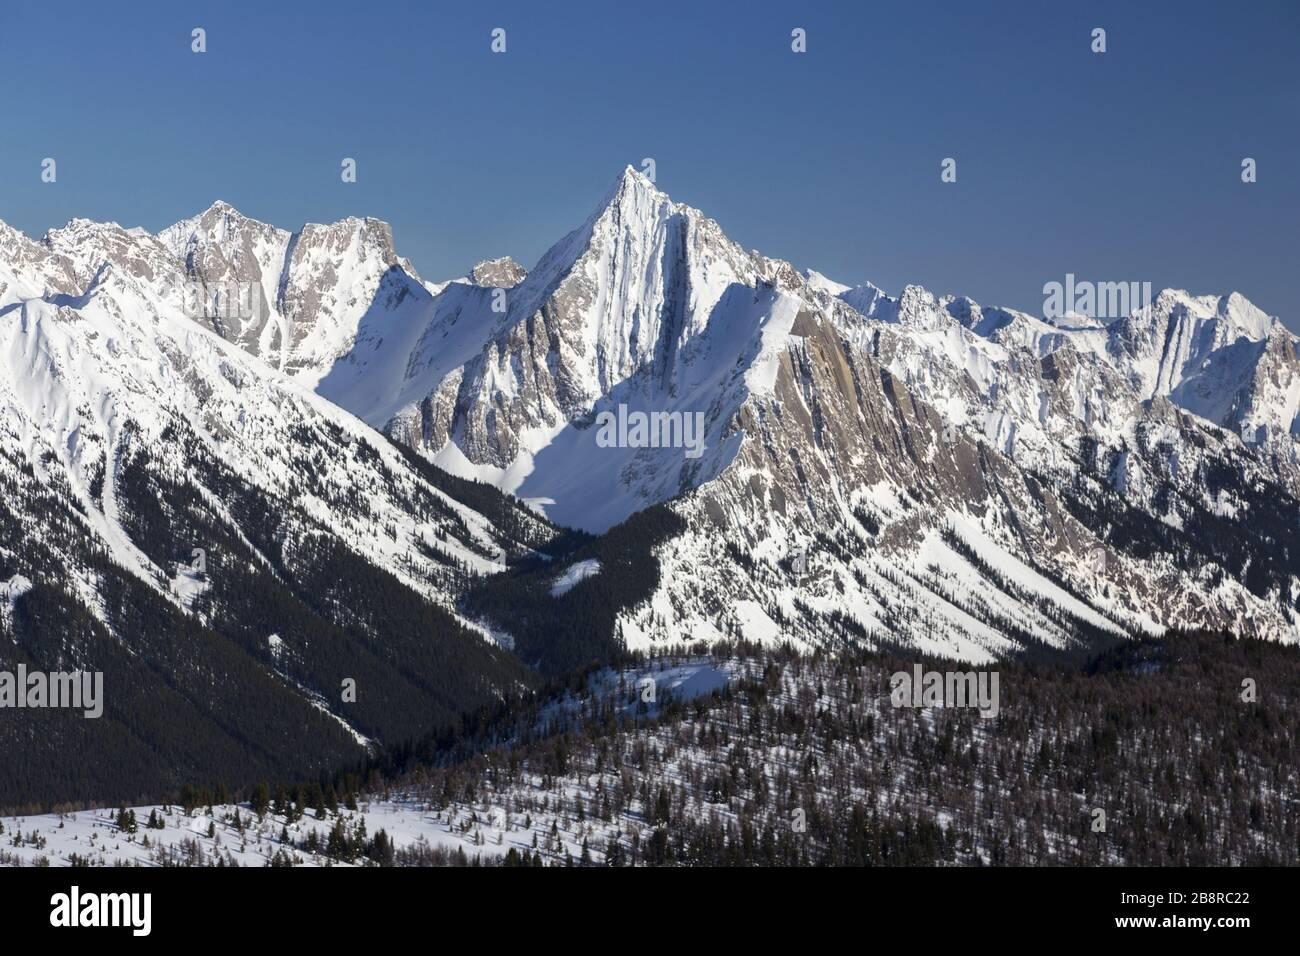 scenic-landscape-view-of-mount-ishbel-sn